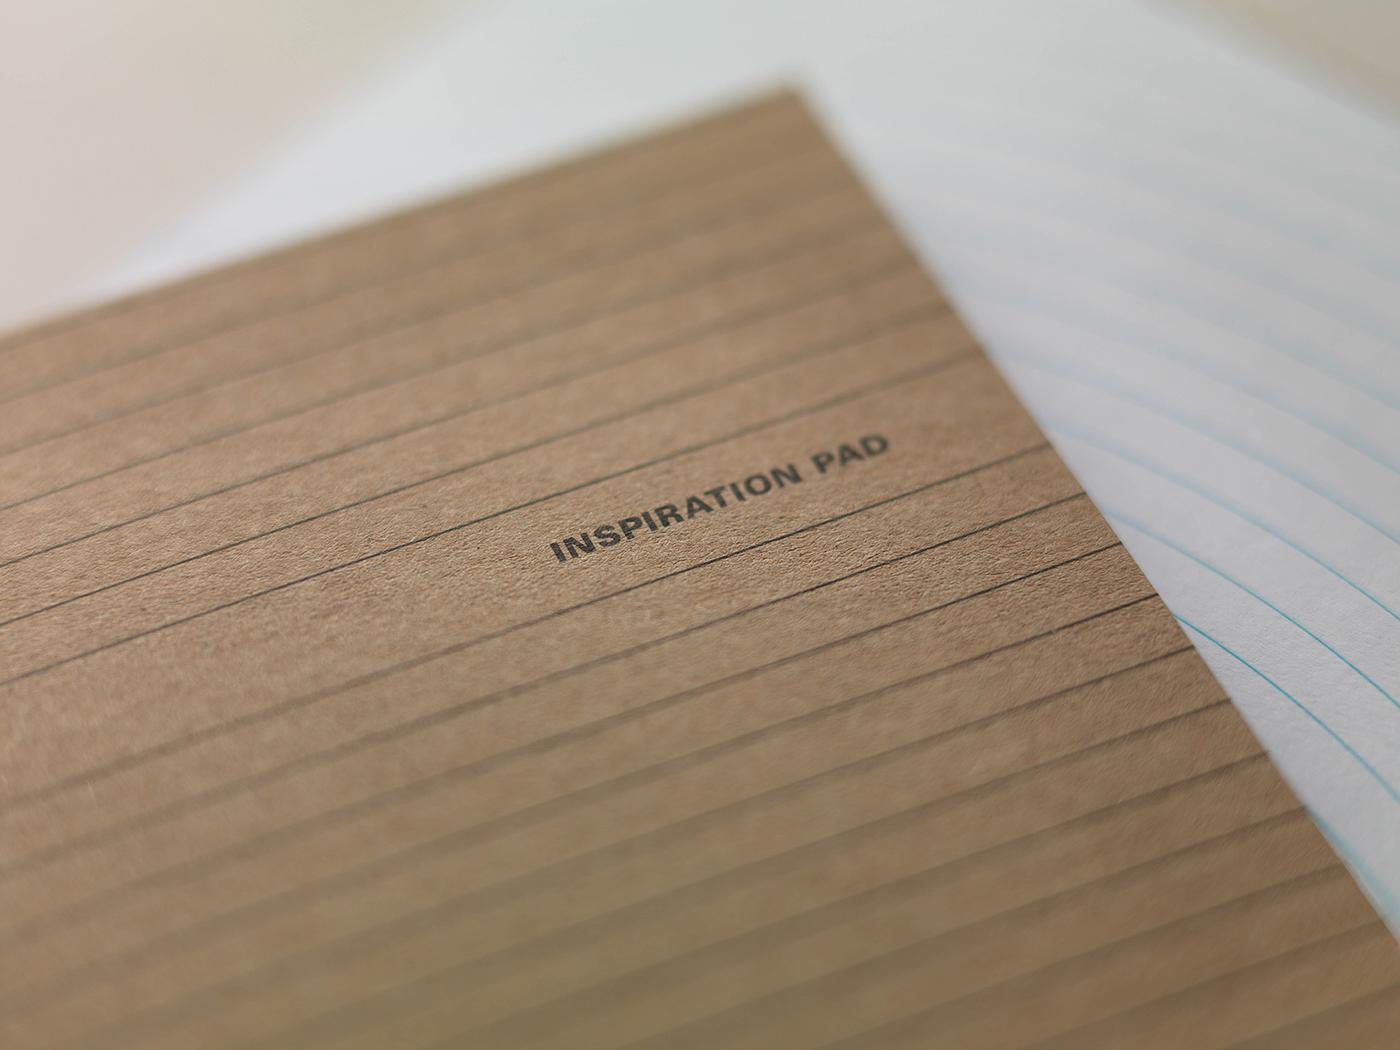 Adobe Portfolio inspirationpad inspiration pad graphic lines notebook new tm thomasset warped brussels belgium Creativity creative pages